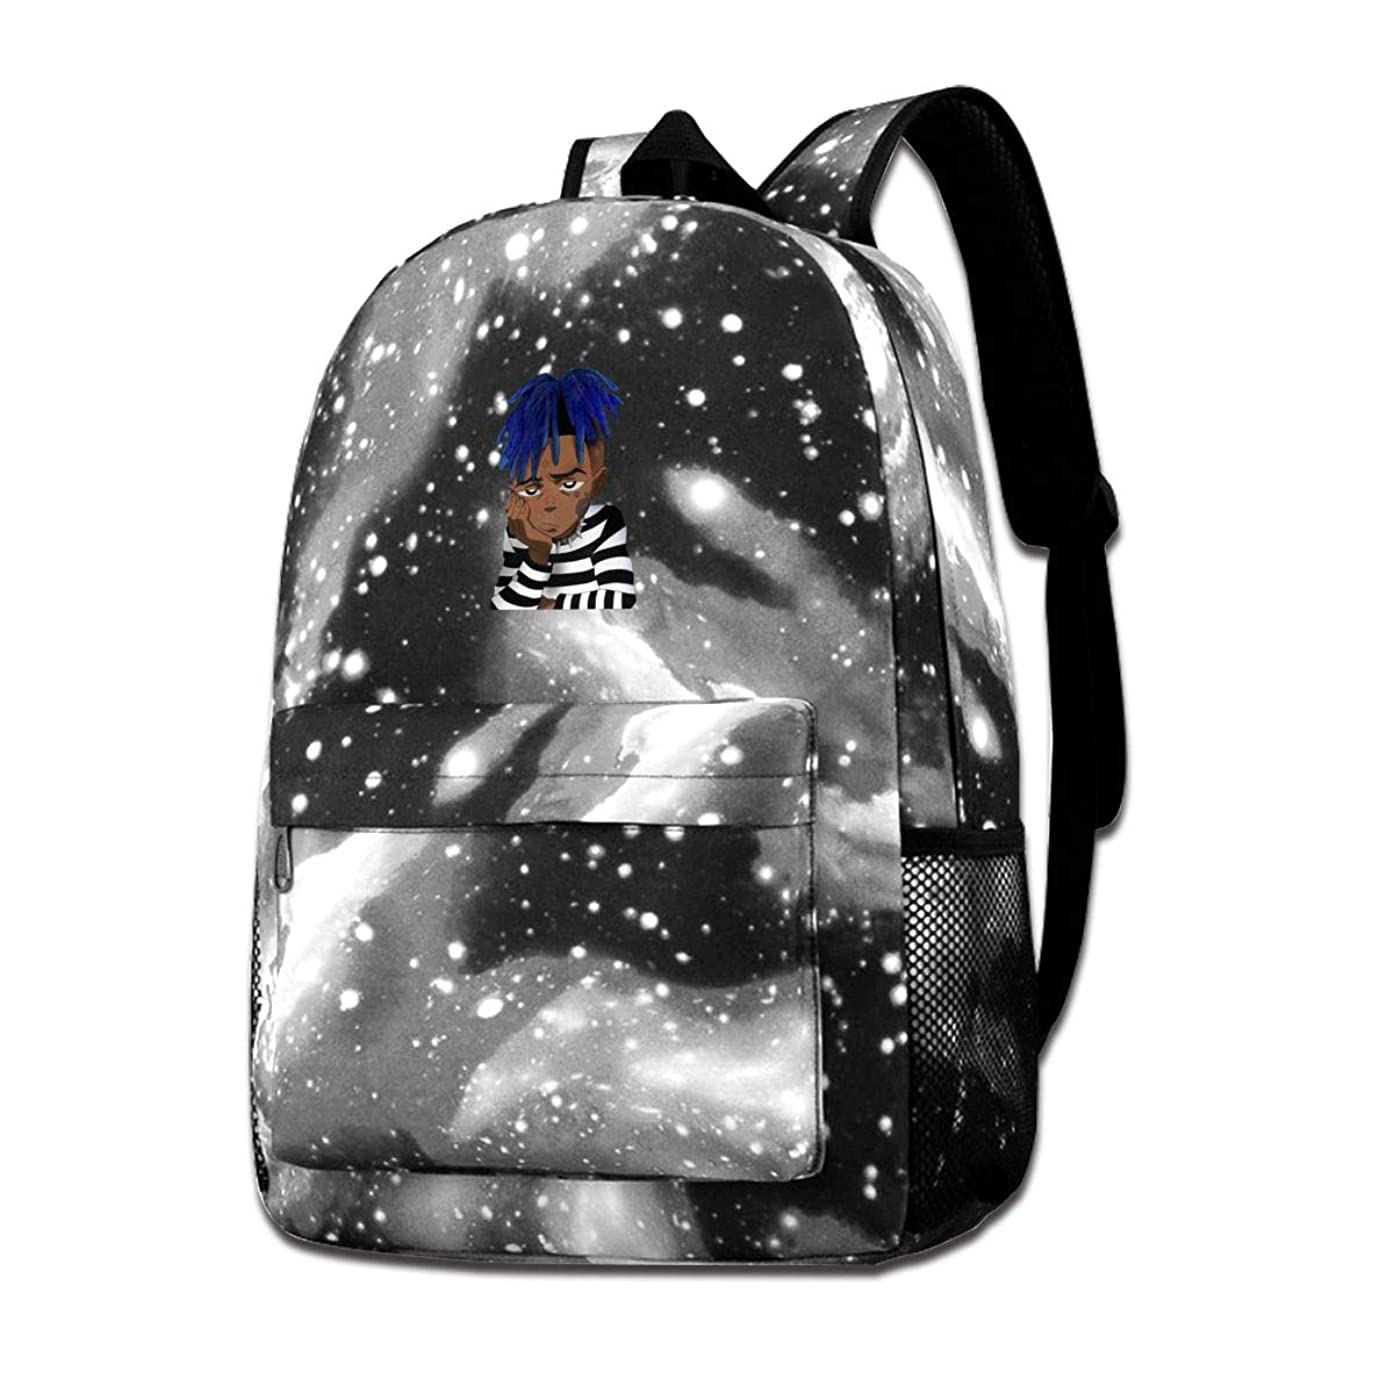 Rapper XXX-tentacion Art Galaxy Student Backpack, Durable CasualSchool Bookbag Shoulder Bag Laptop Backpack Rucksack Daypack 15.74 X 11 X 3.95inch